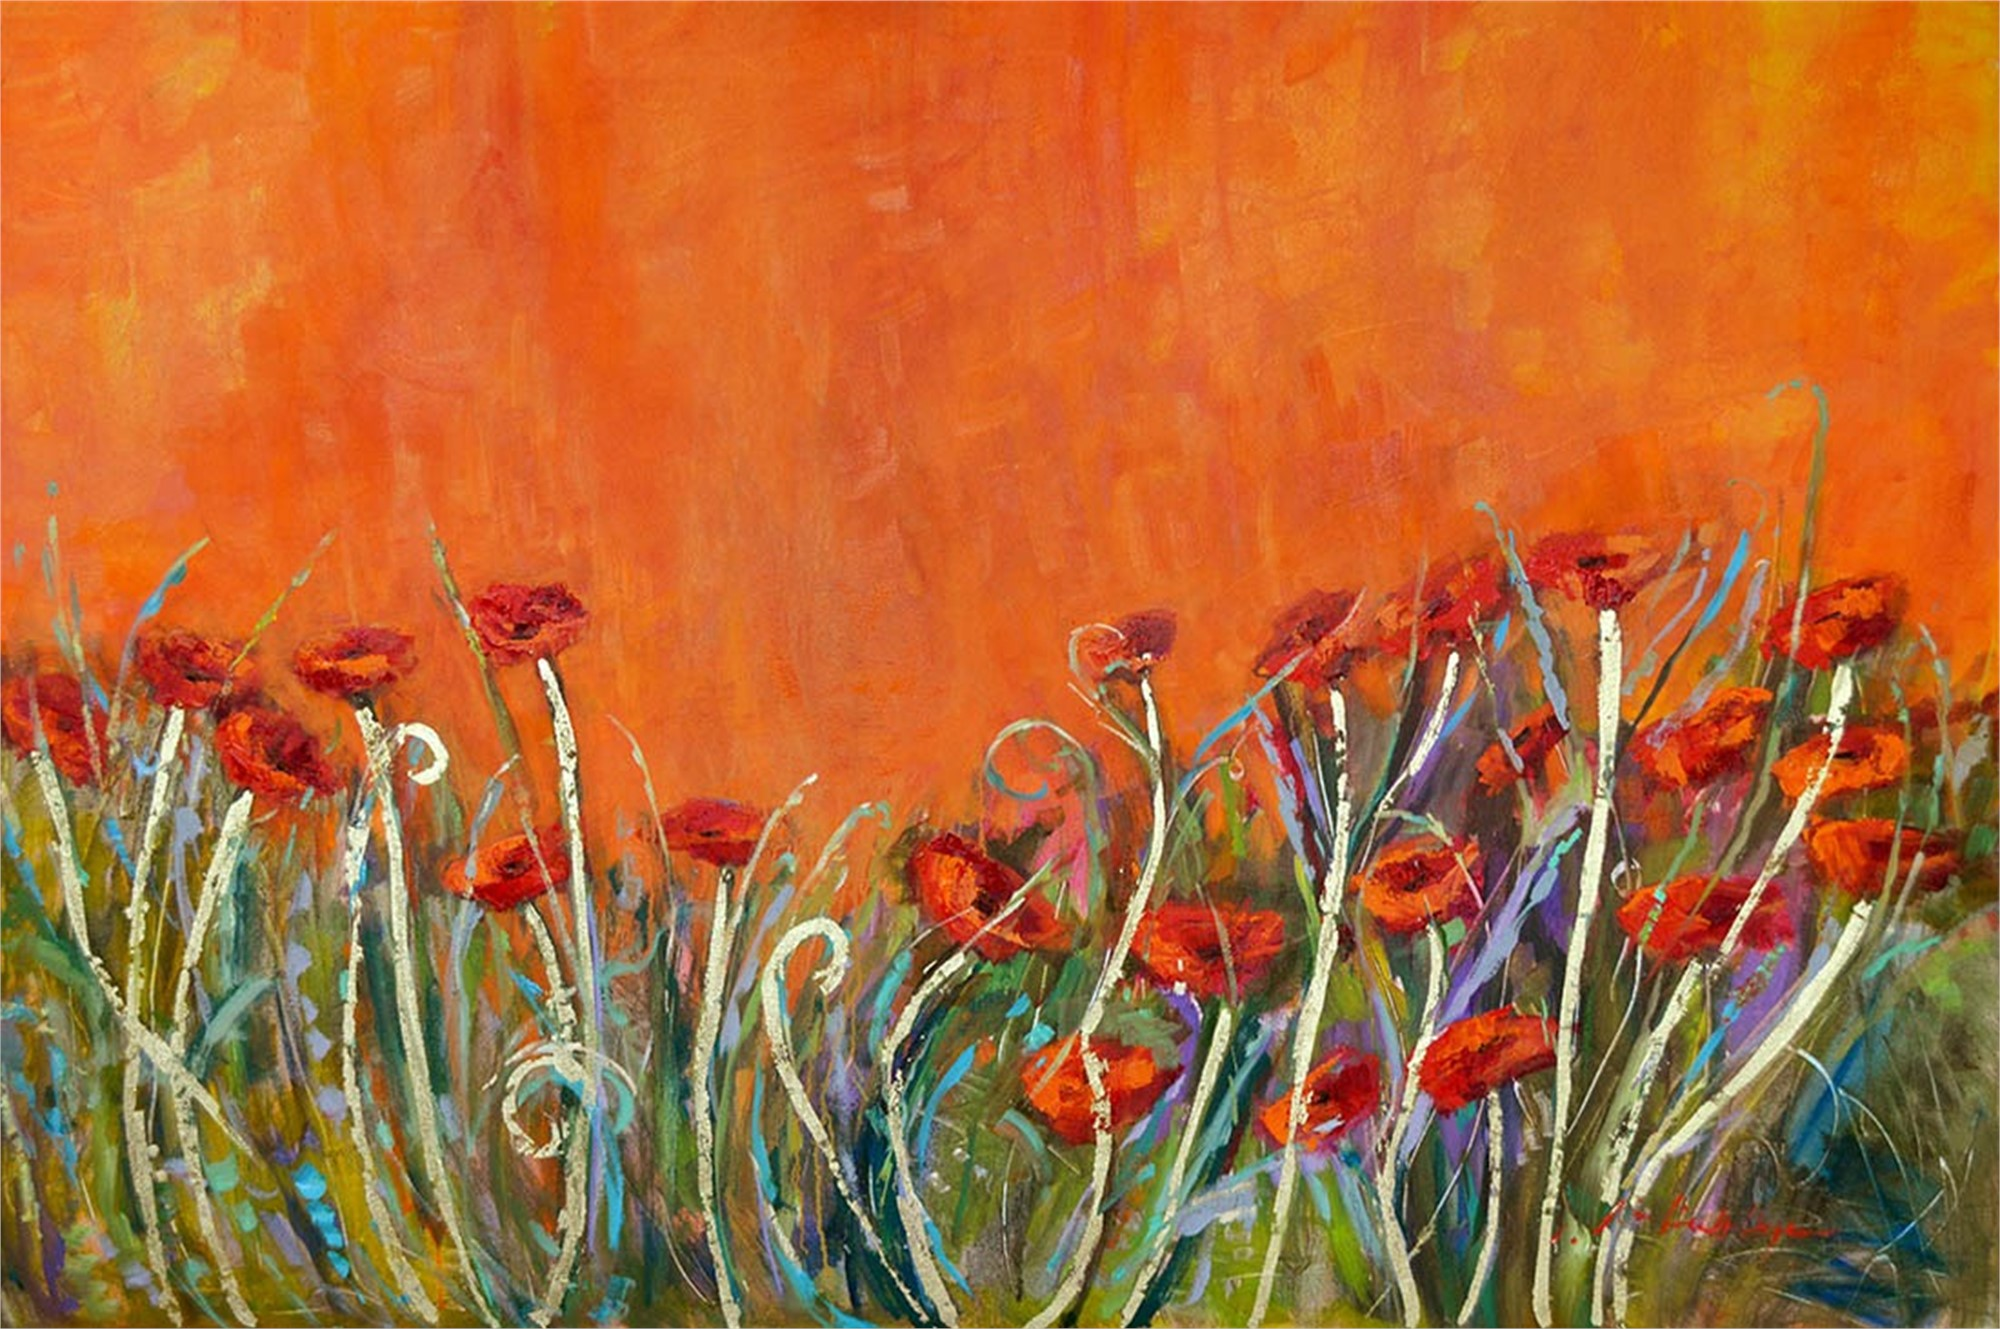 Glorious Poppies of Tuscany by Karen Hewitt Hagan